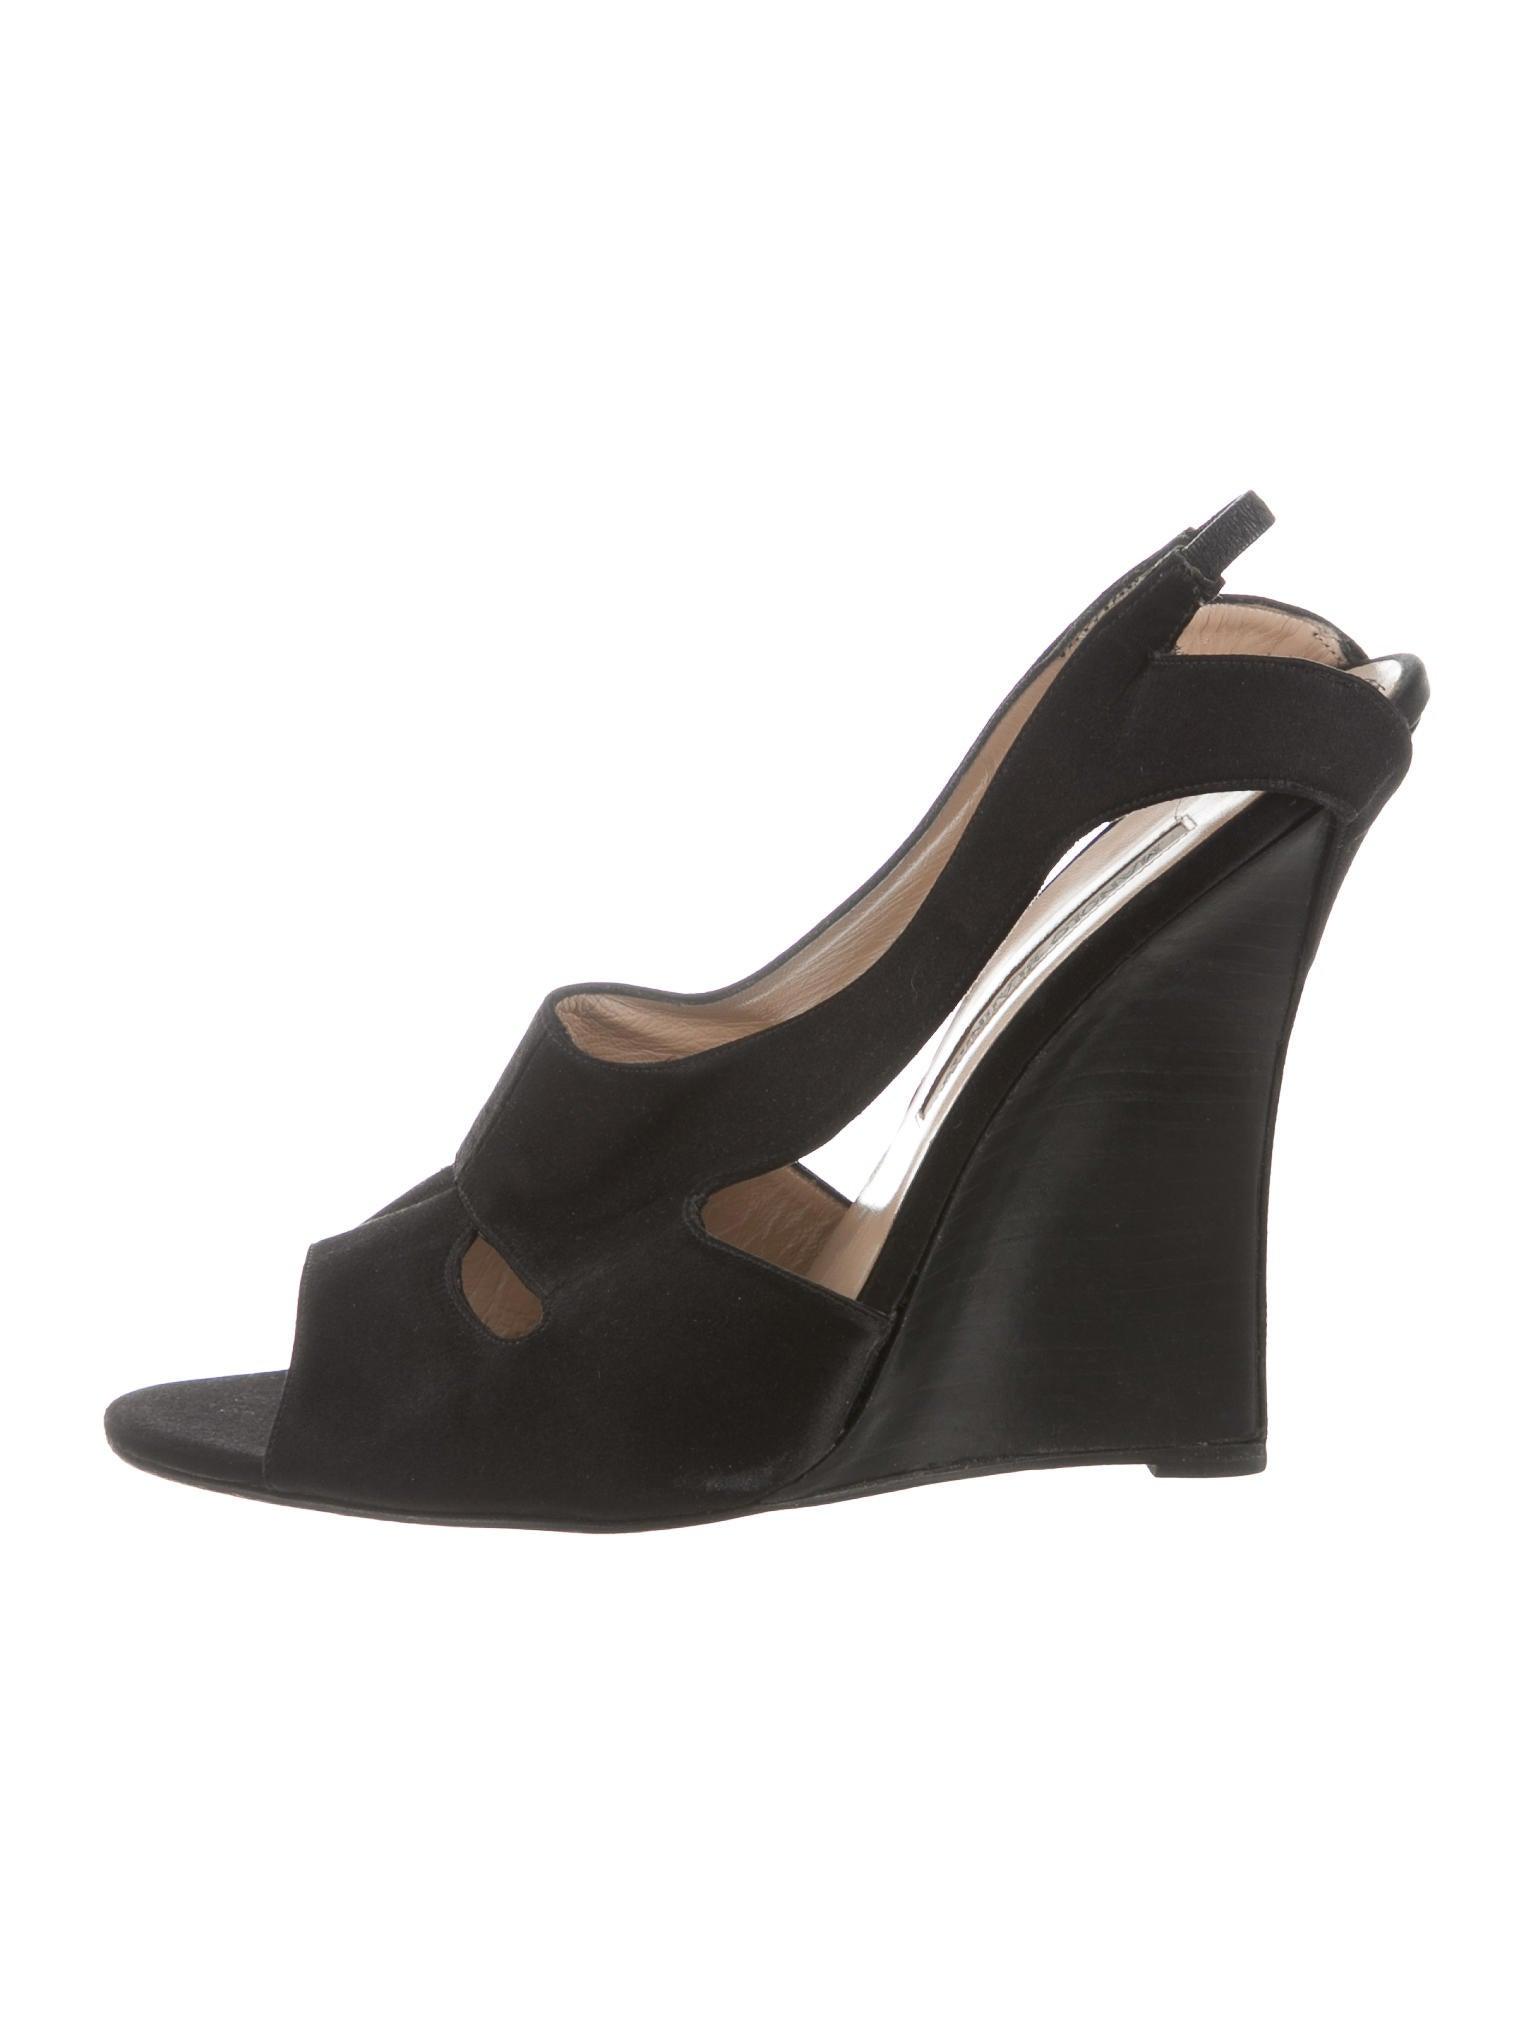 manolo blahnik satin wedge sandals shoes moo64532